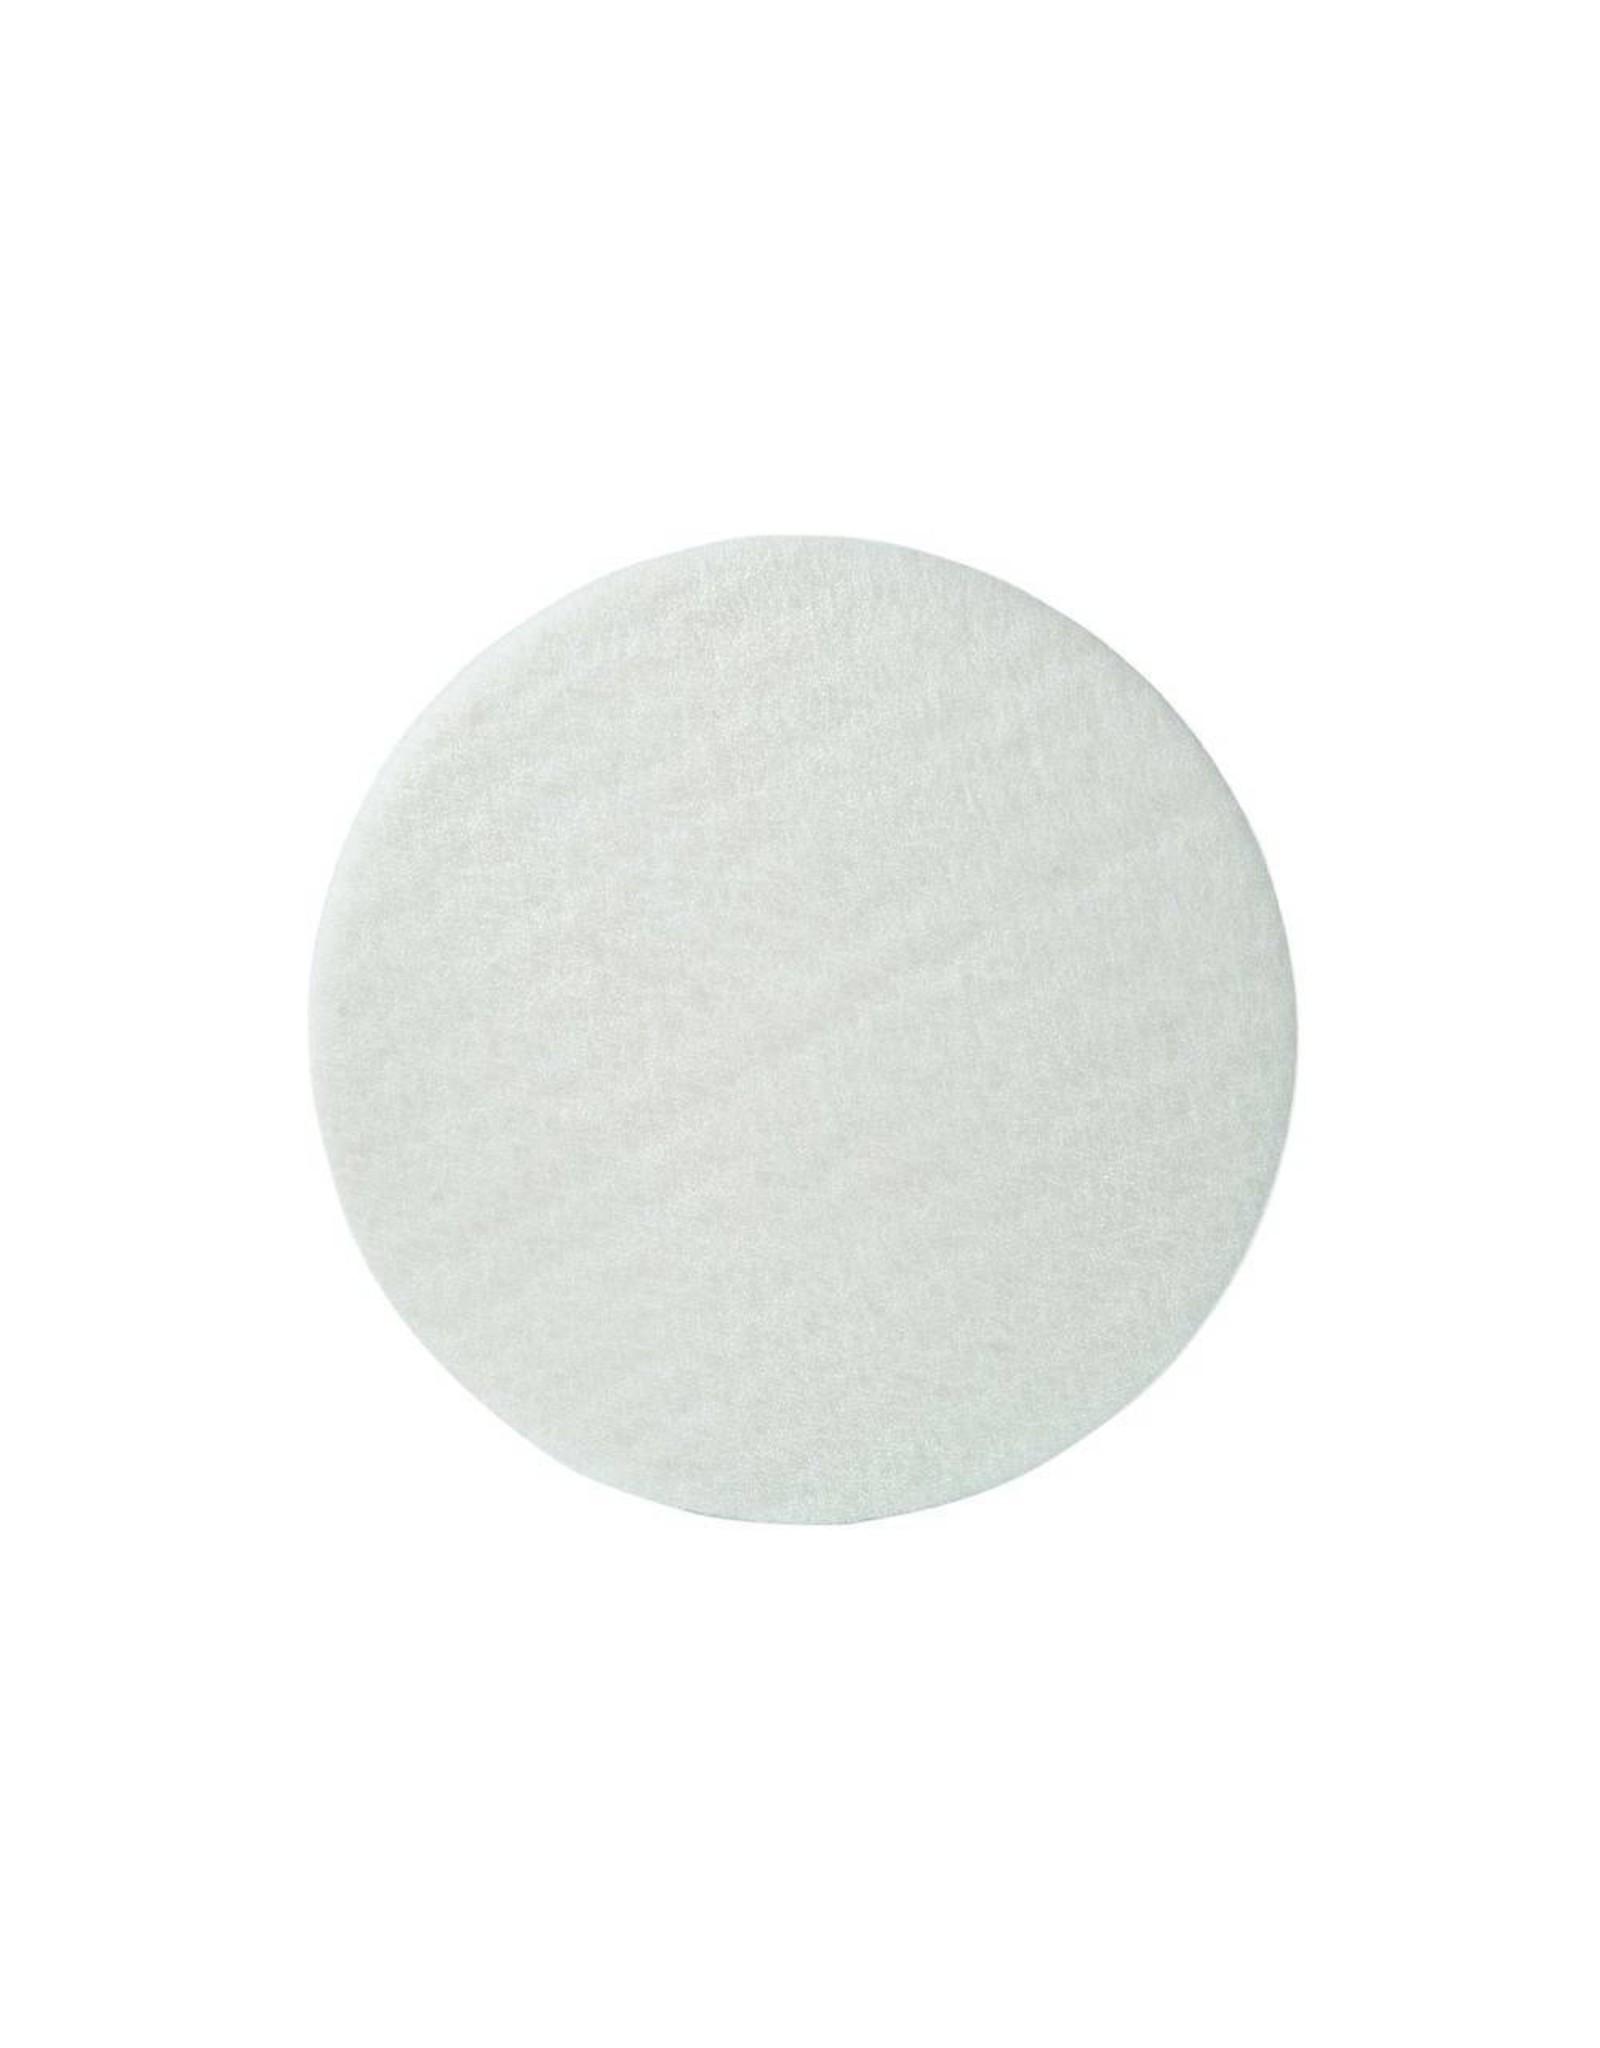 ACOR Nylon Pads Wit - 33 CM, 2CM, 13 inch (High Quality)